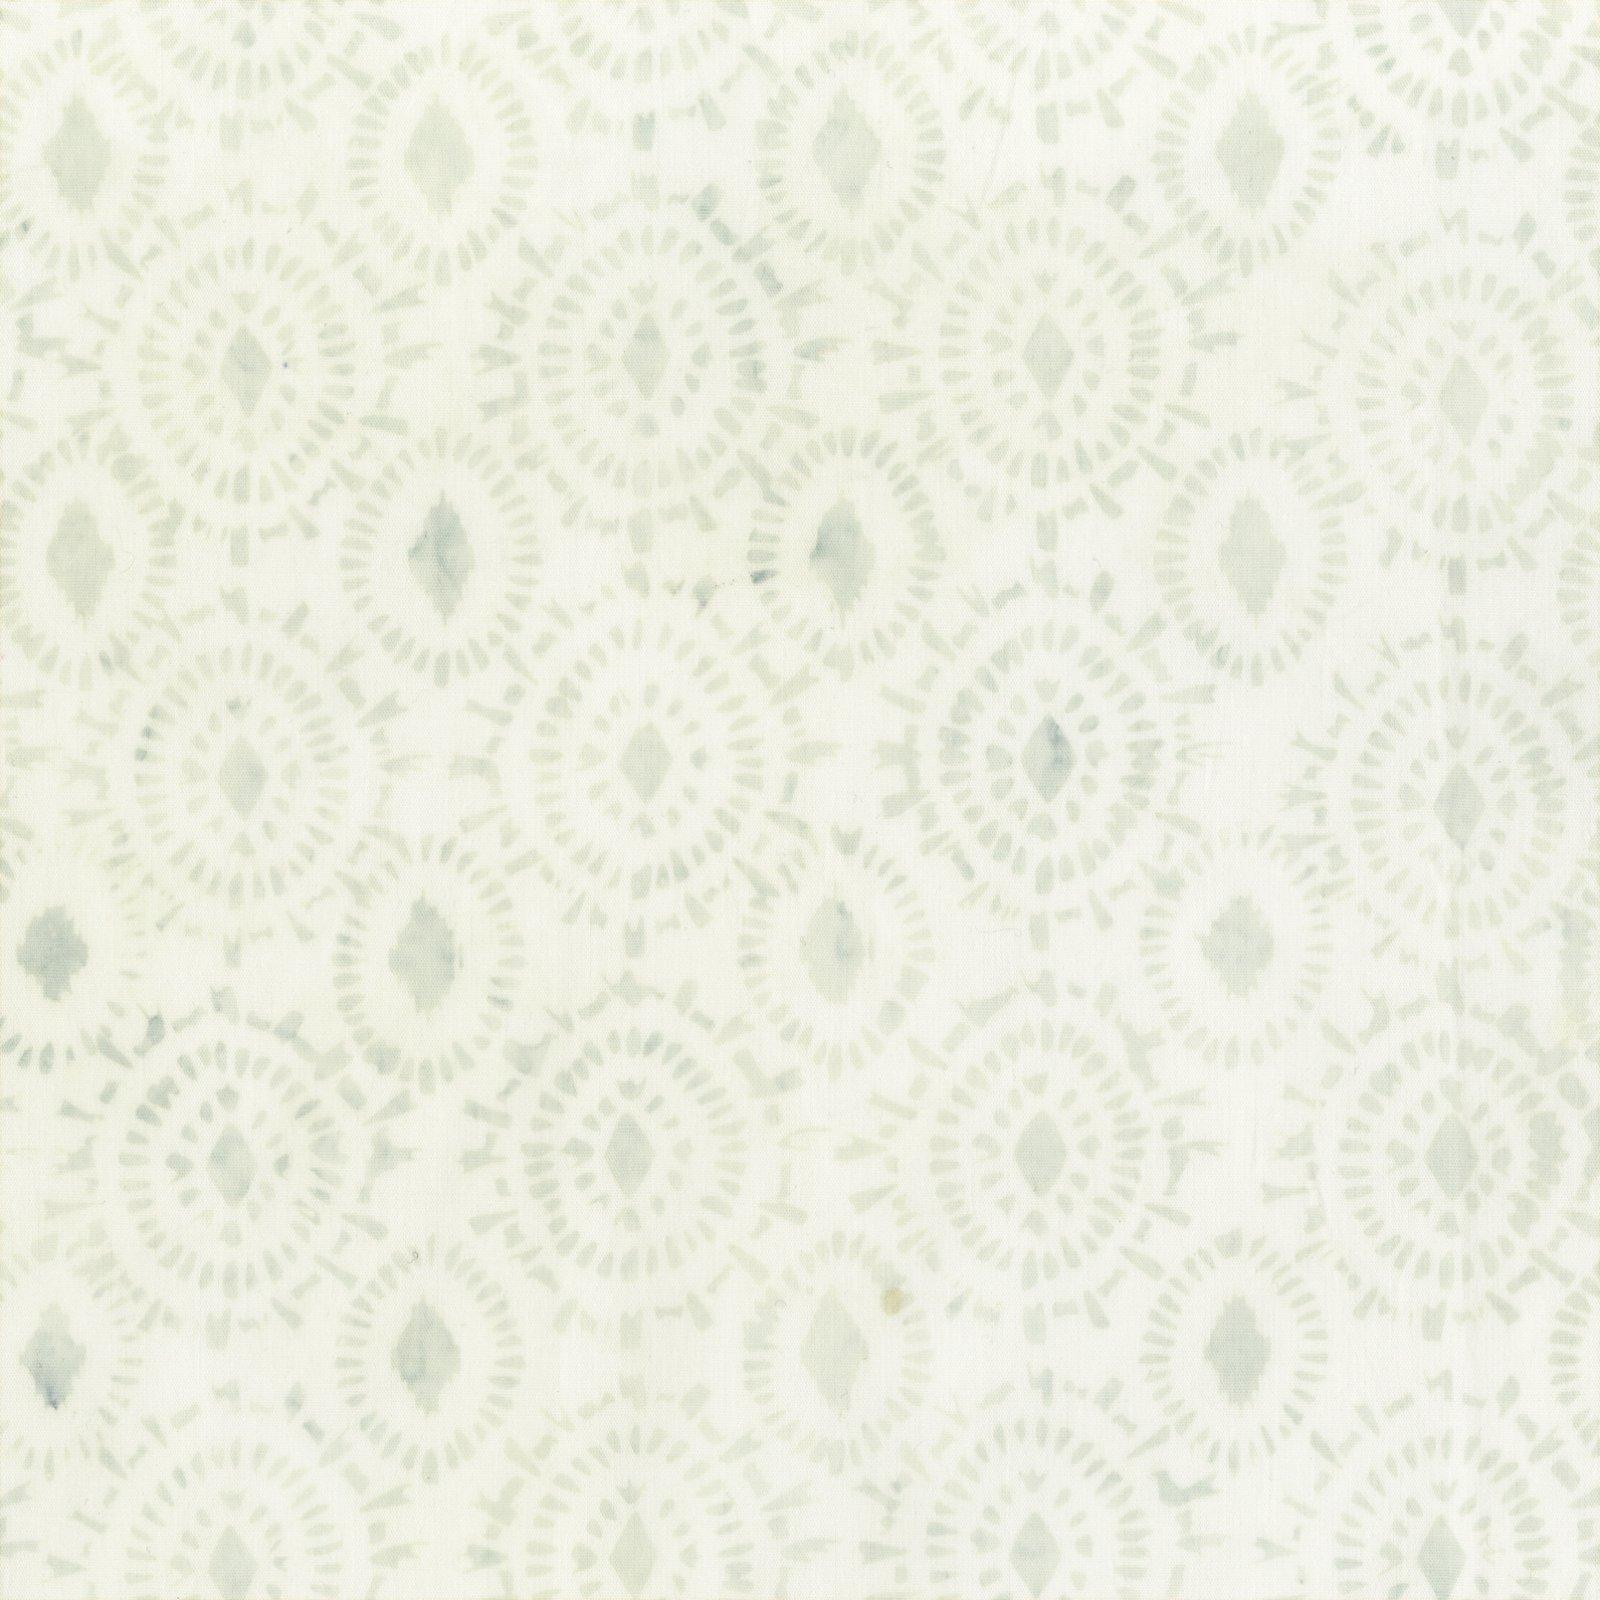 600Q-1 108 Batik Wide Back